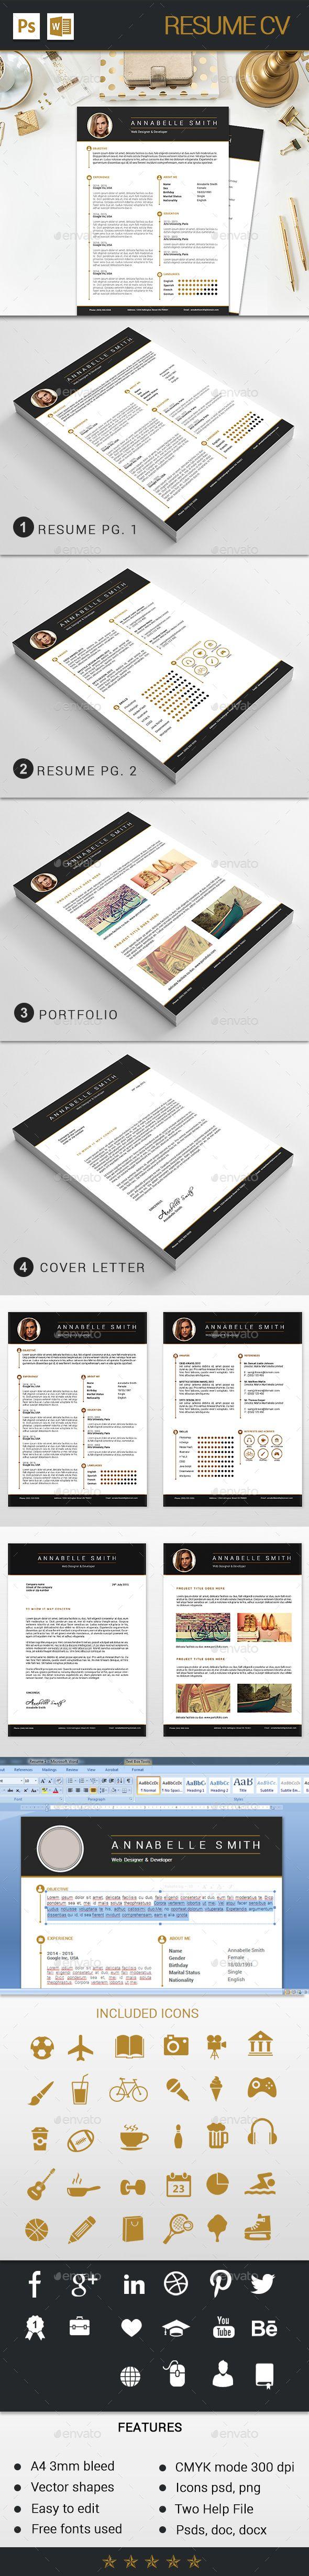 Resume cv | Resume cv, Cv template and Template